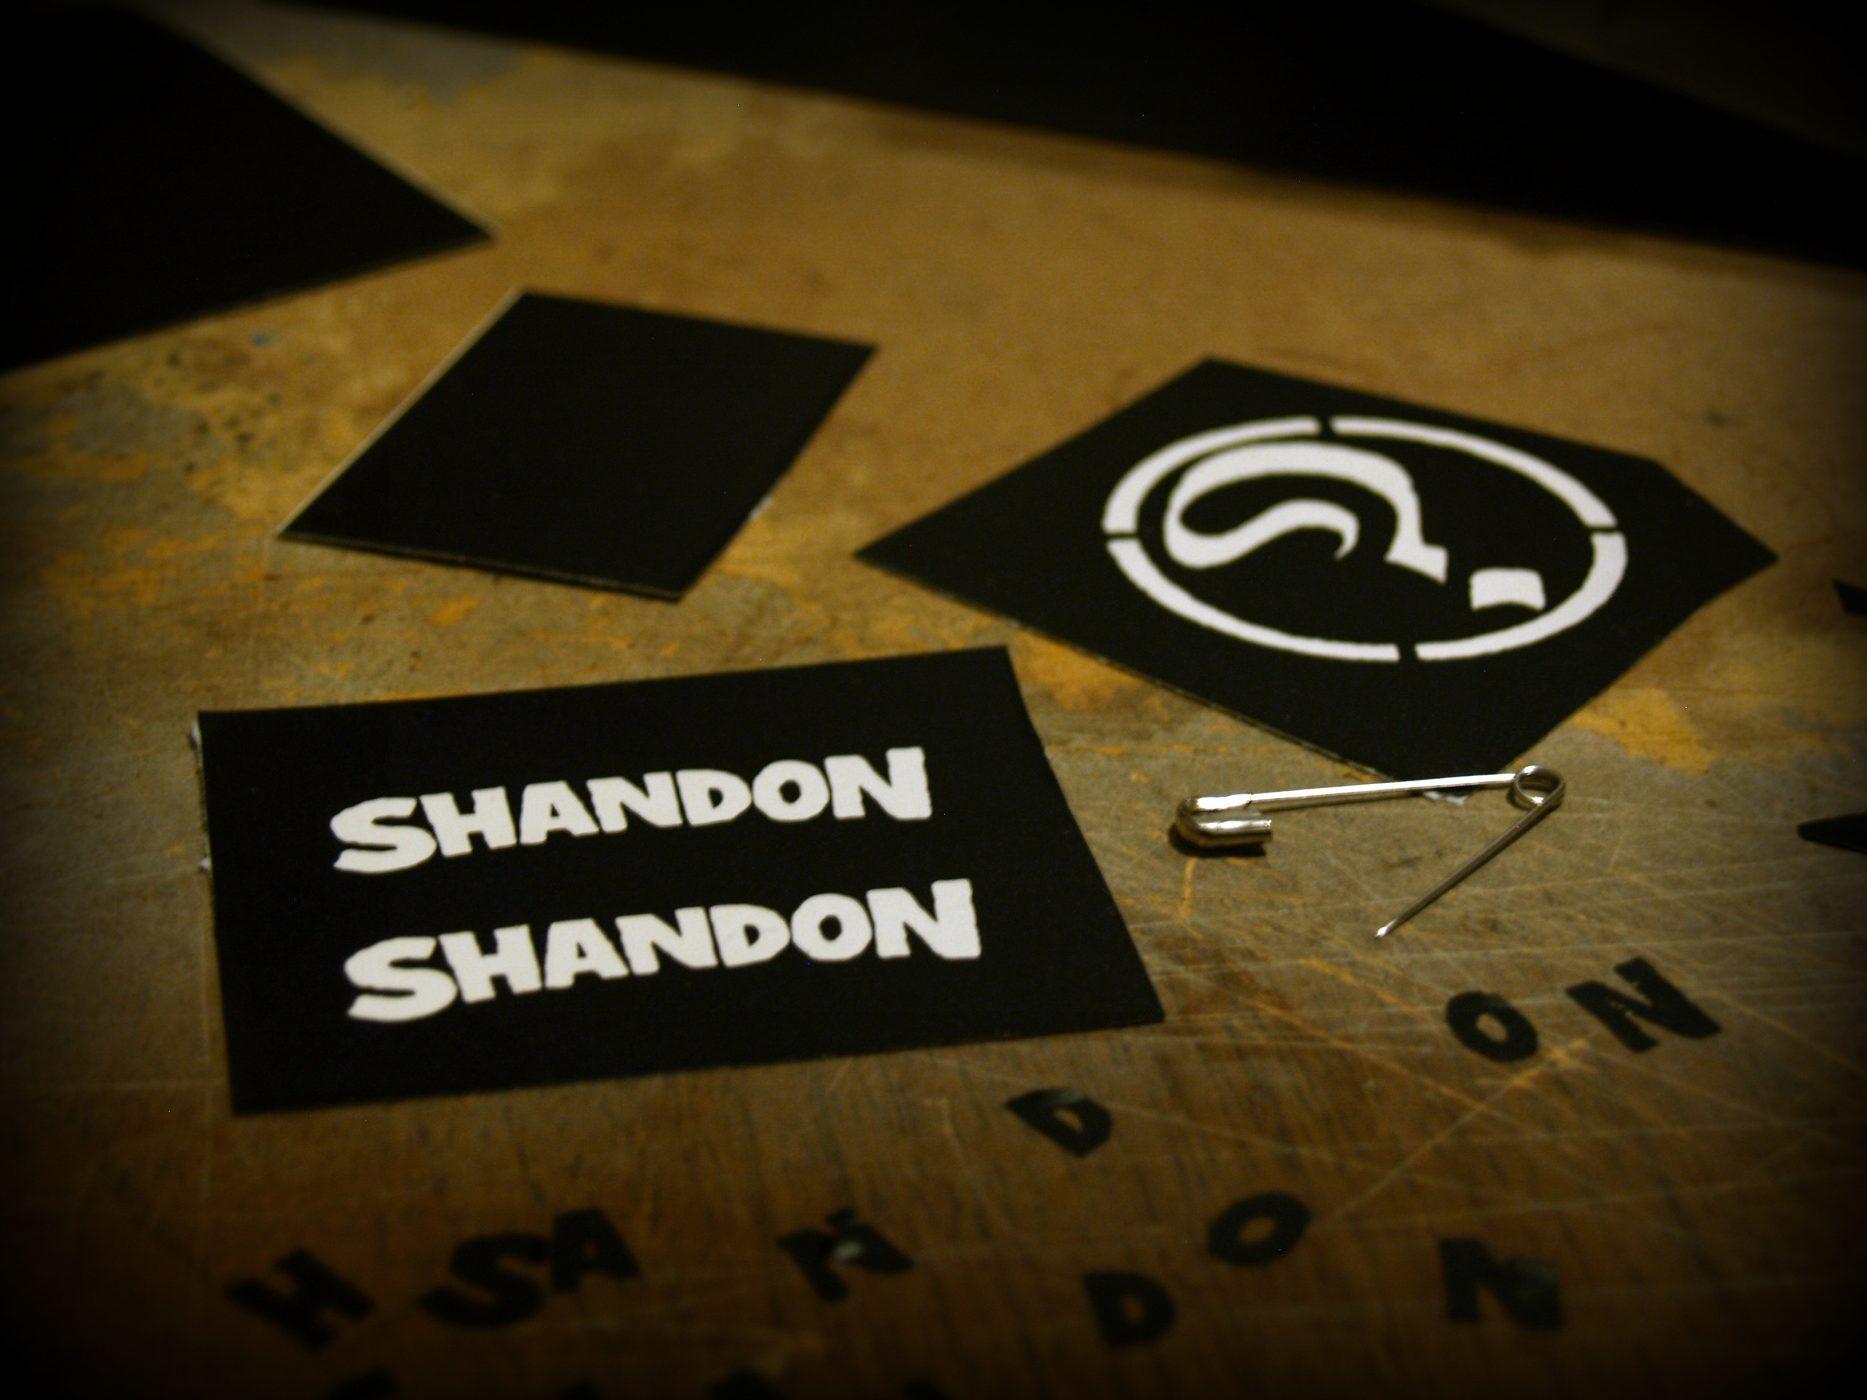 Shandon All-Mountain BespokedUK 2016 Show